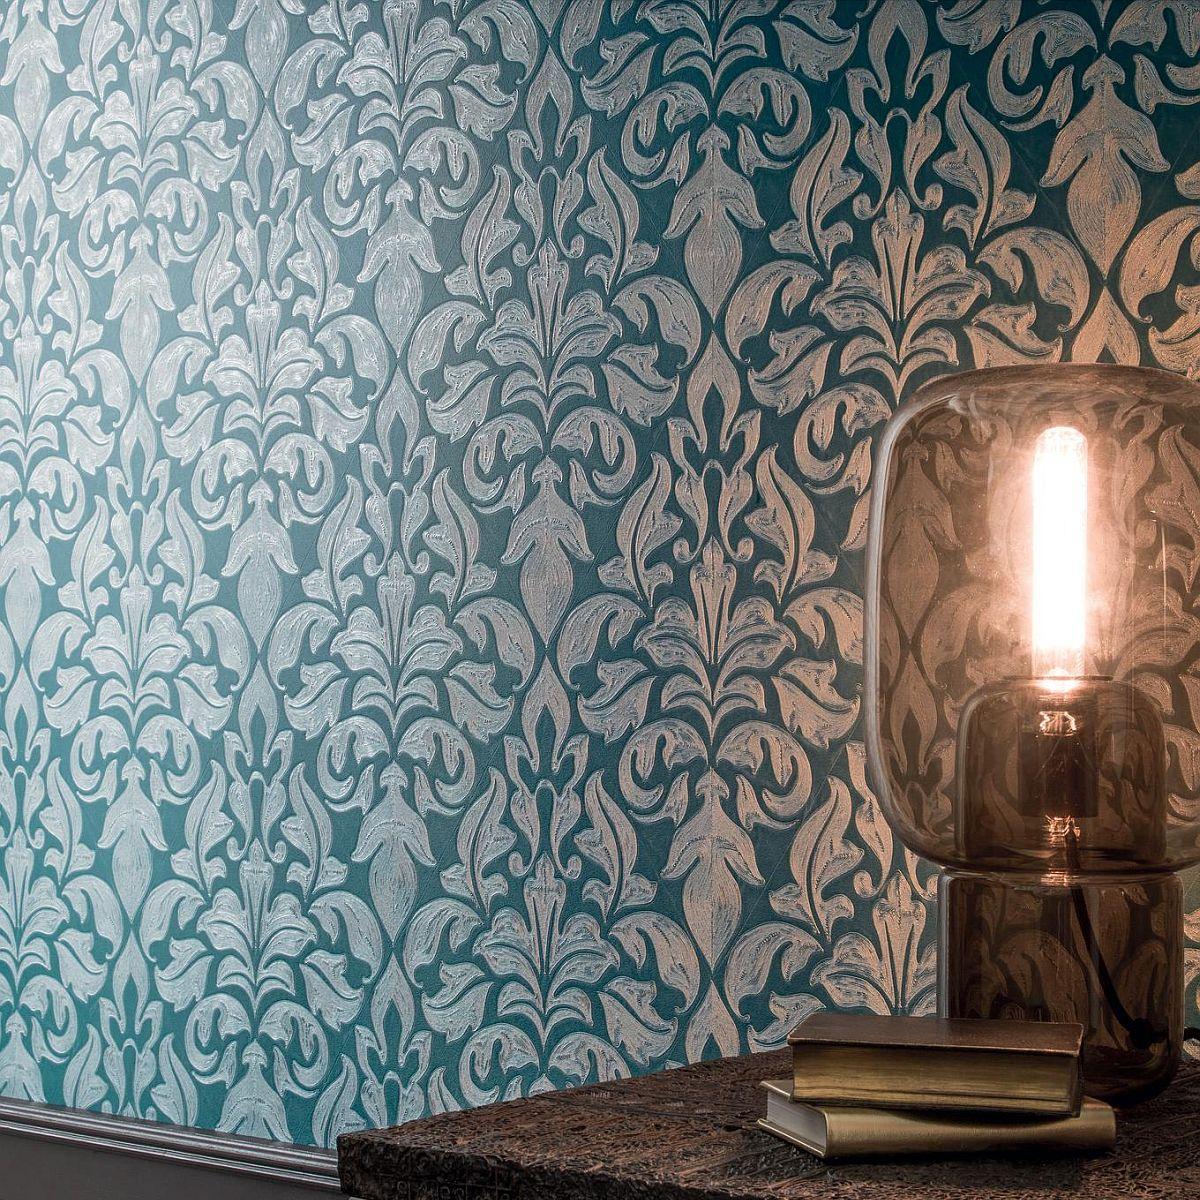 metalltr streichen good cool kollektion domus farbe naturbraun with teppich mnchen with. Black Bedroom Furniture Sets. Home Design Ideas